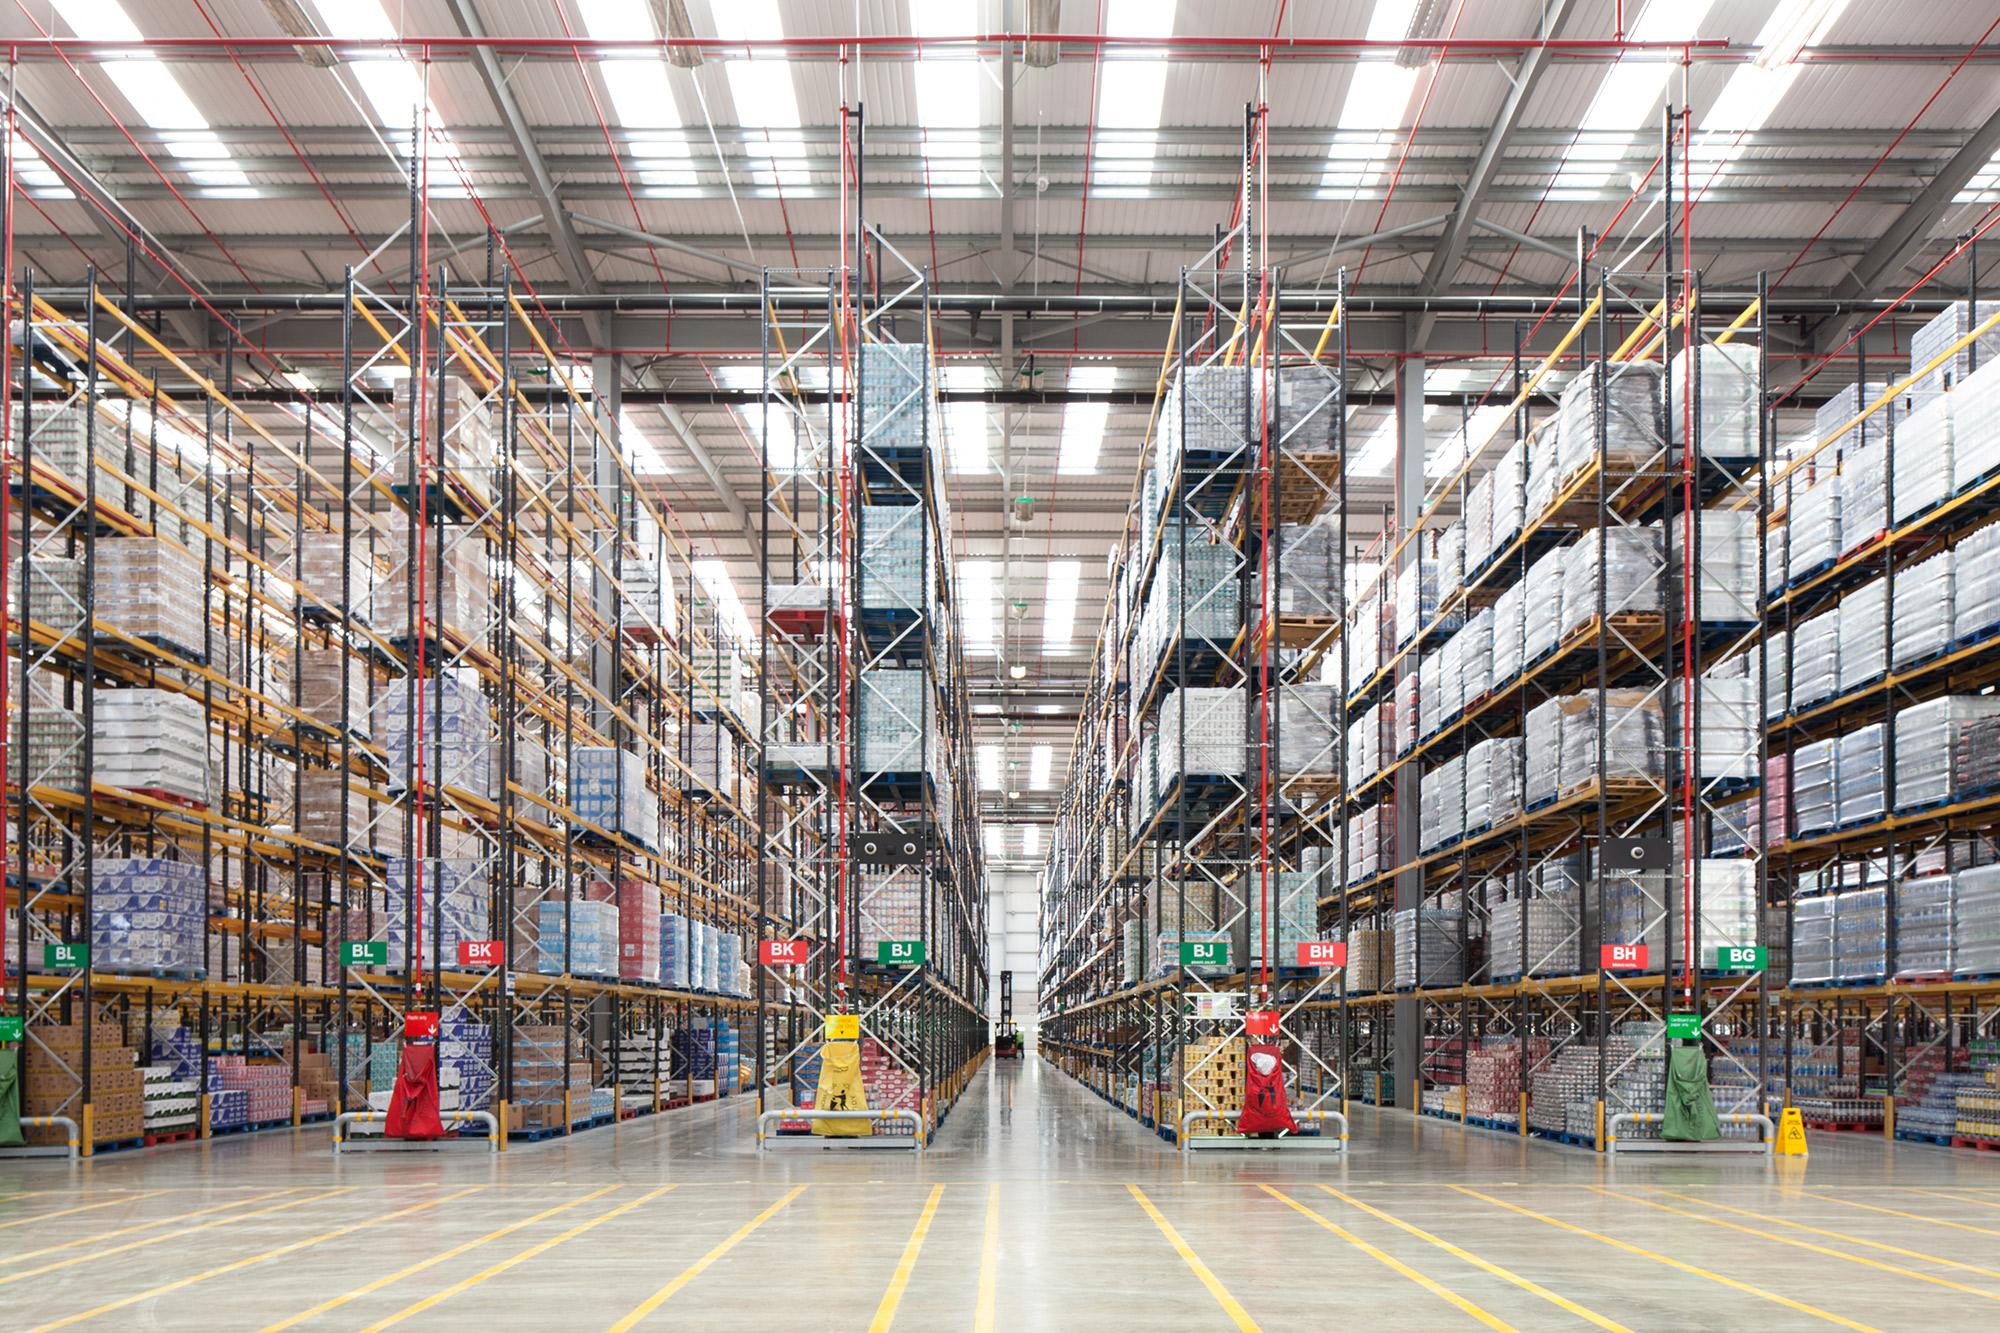 Co op Disrtribtion Centre dispatch high shelves